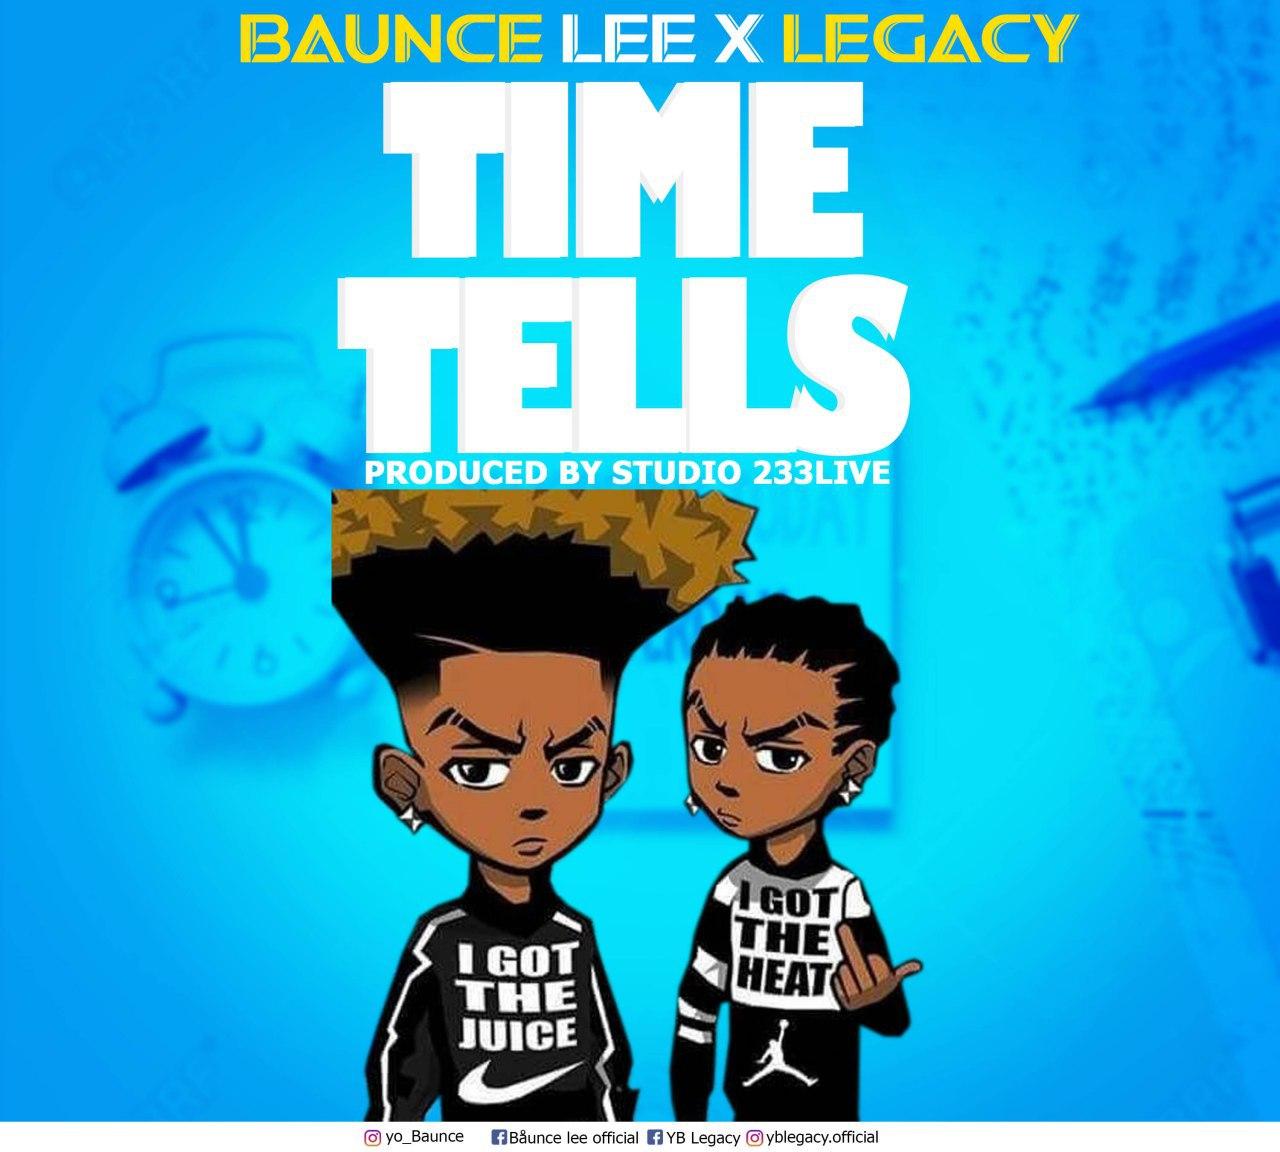 Baunce Lee x Legacy - Time Tells (Prod by Studio 233live)